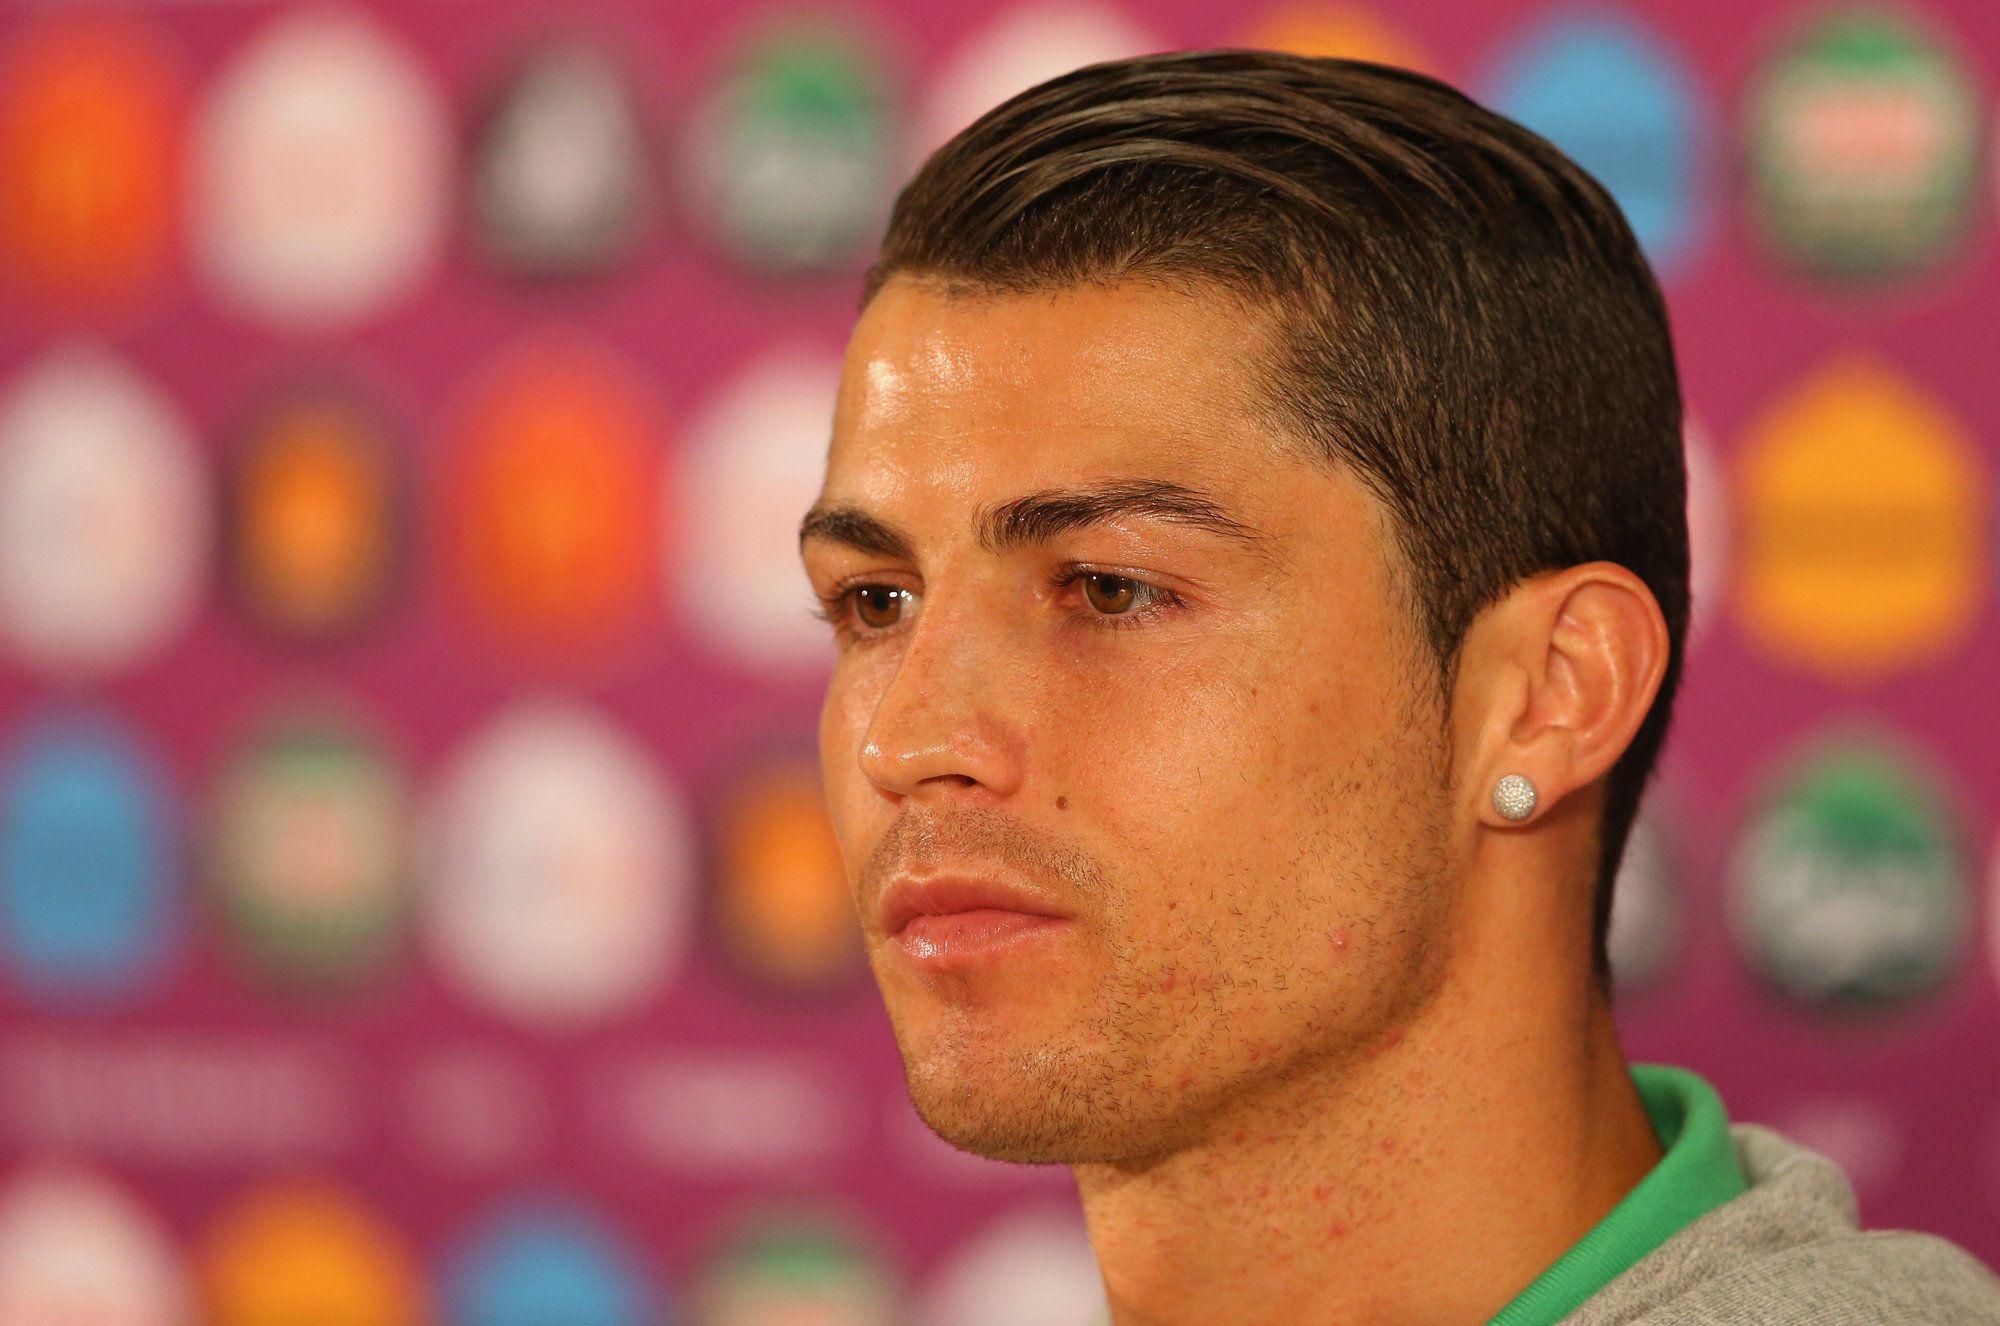 Awesome 70 Inspiring Cristiano Ronaldo Haircut Hairstyles